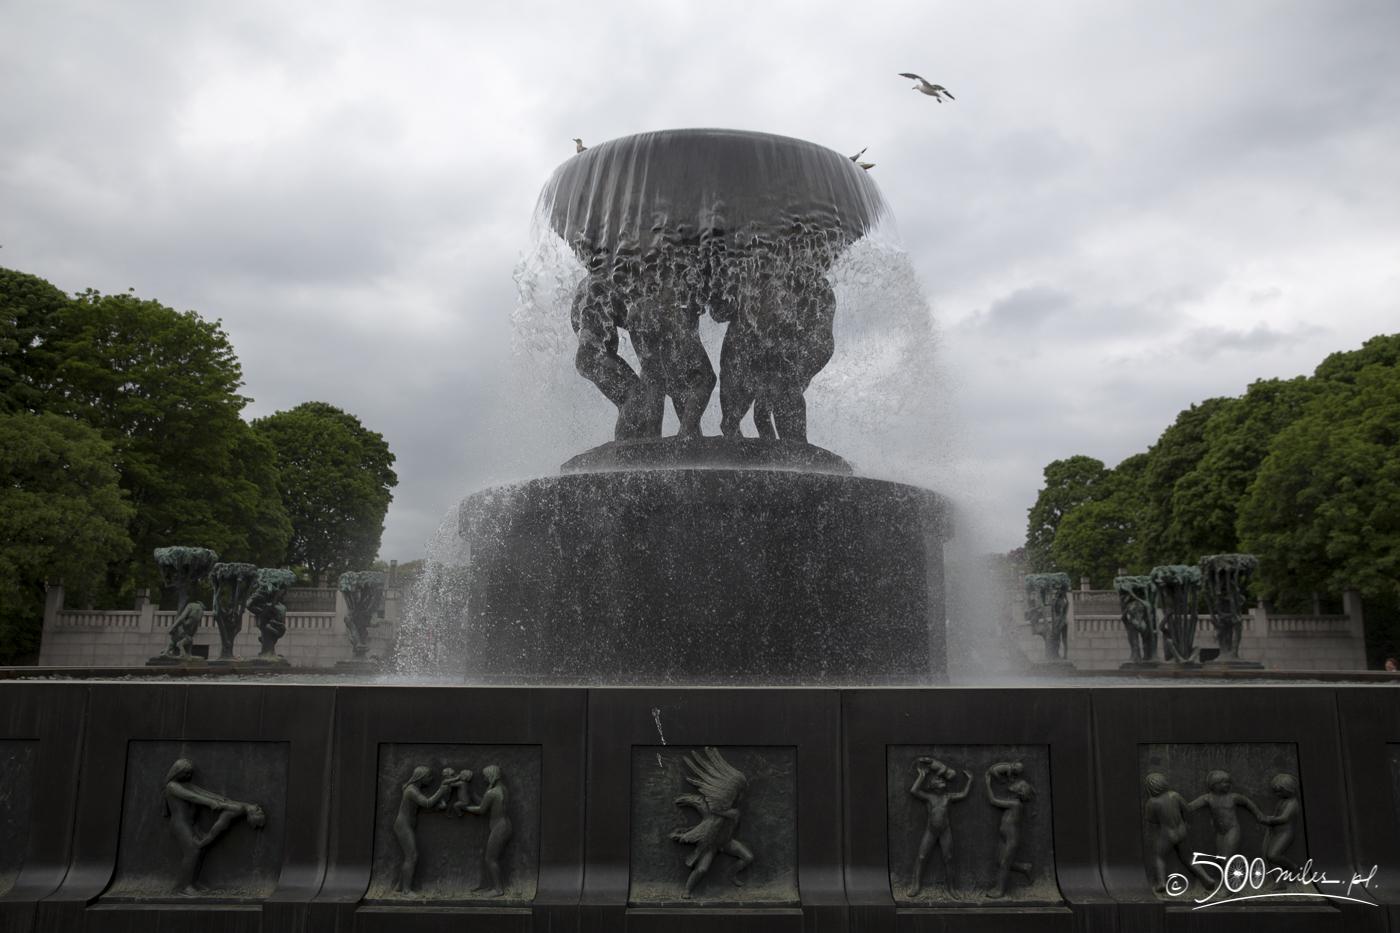 Oslo - Vigeland Park - The wheel of life